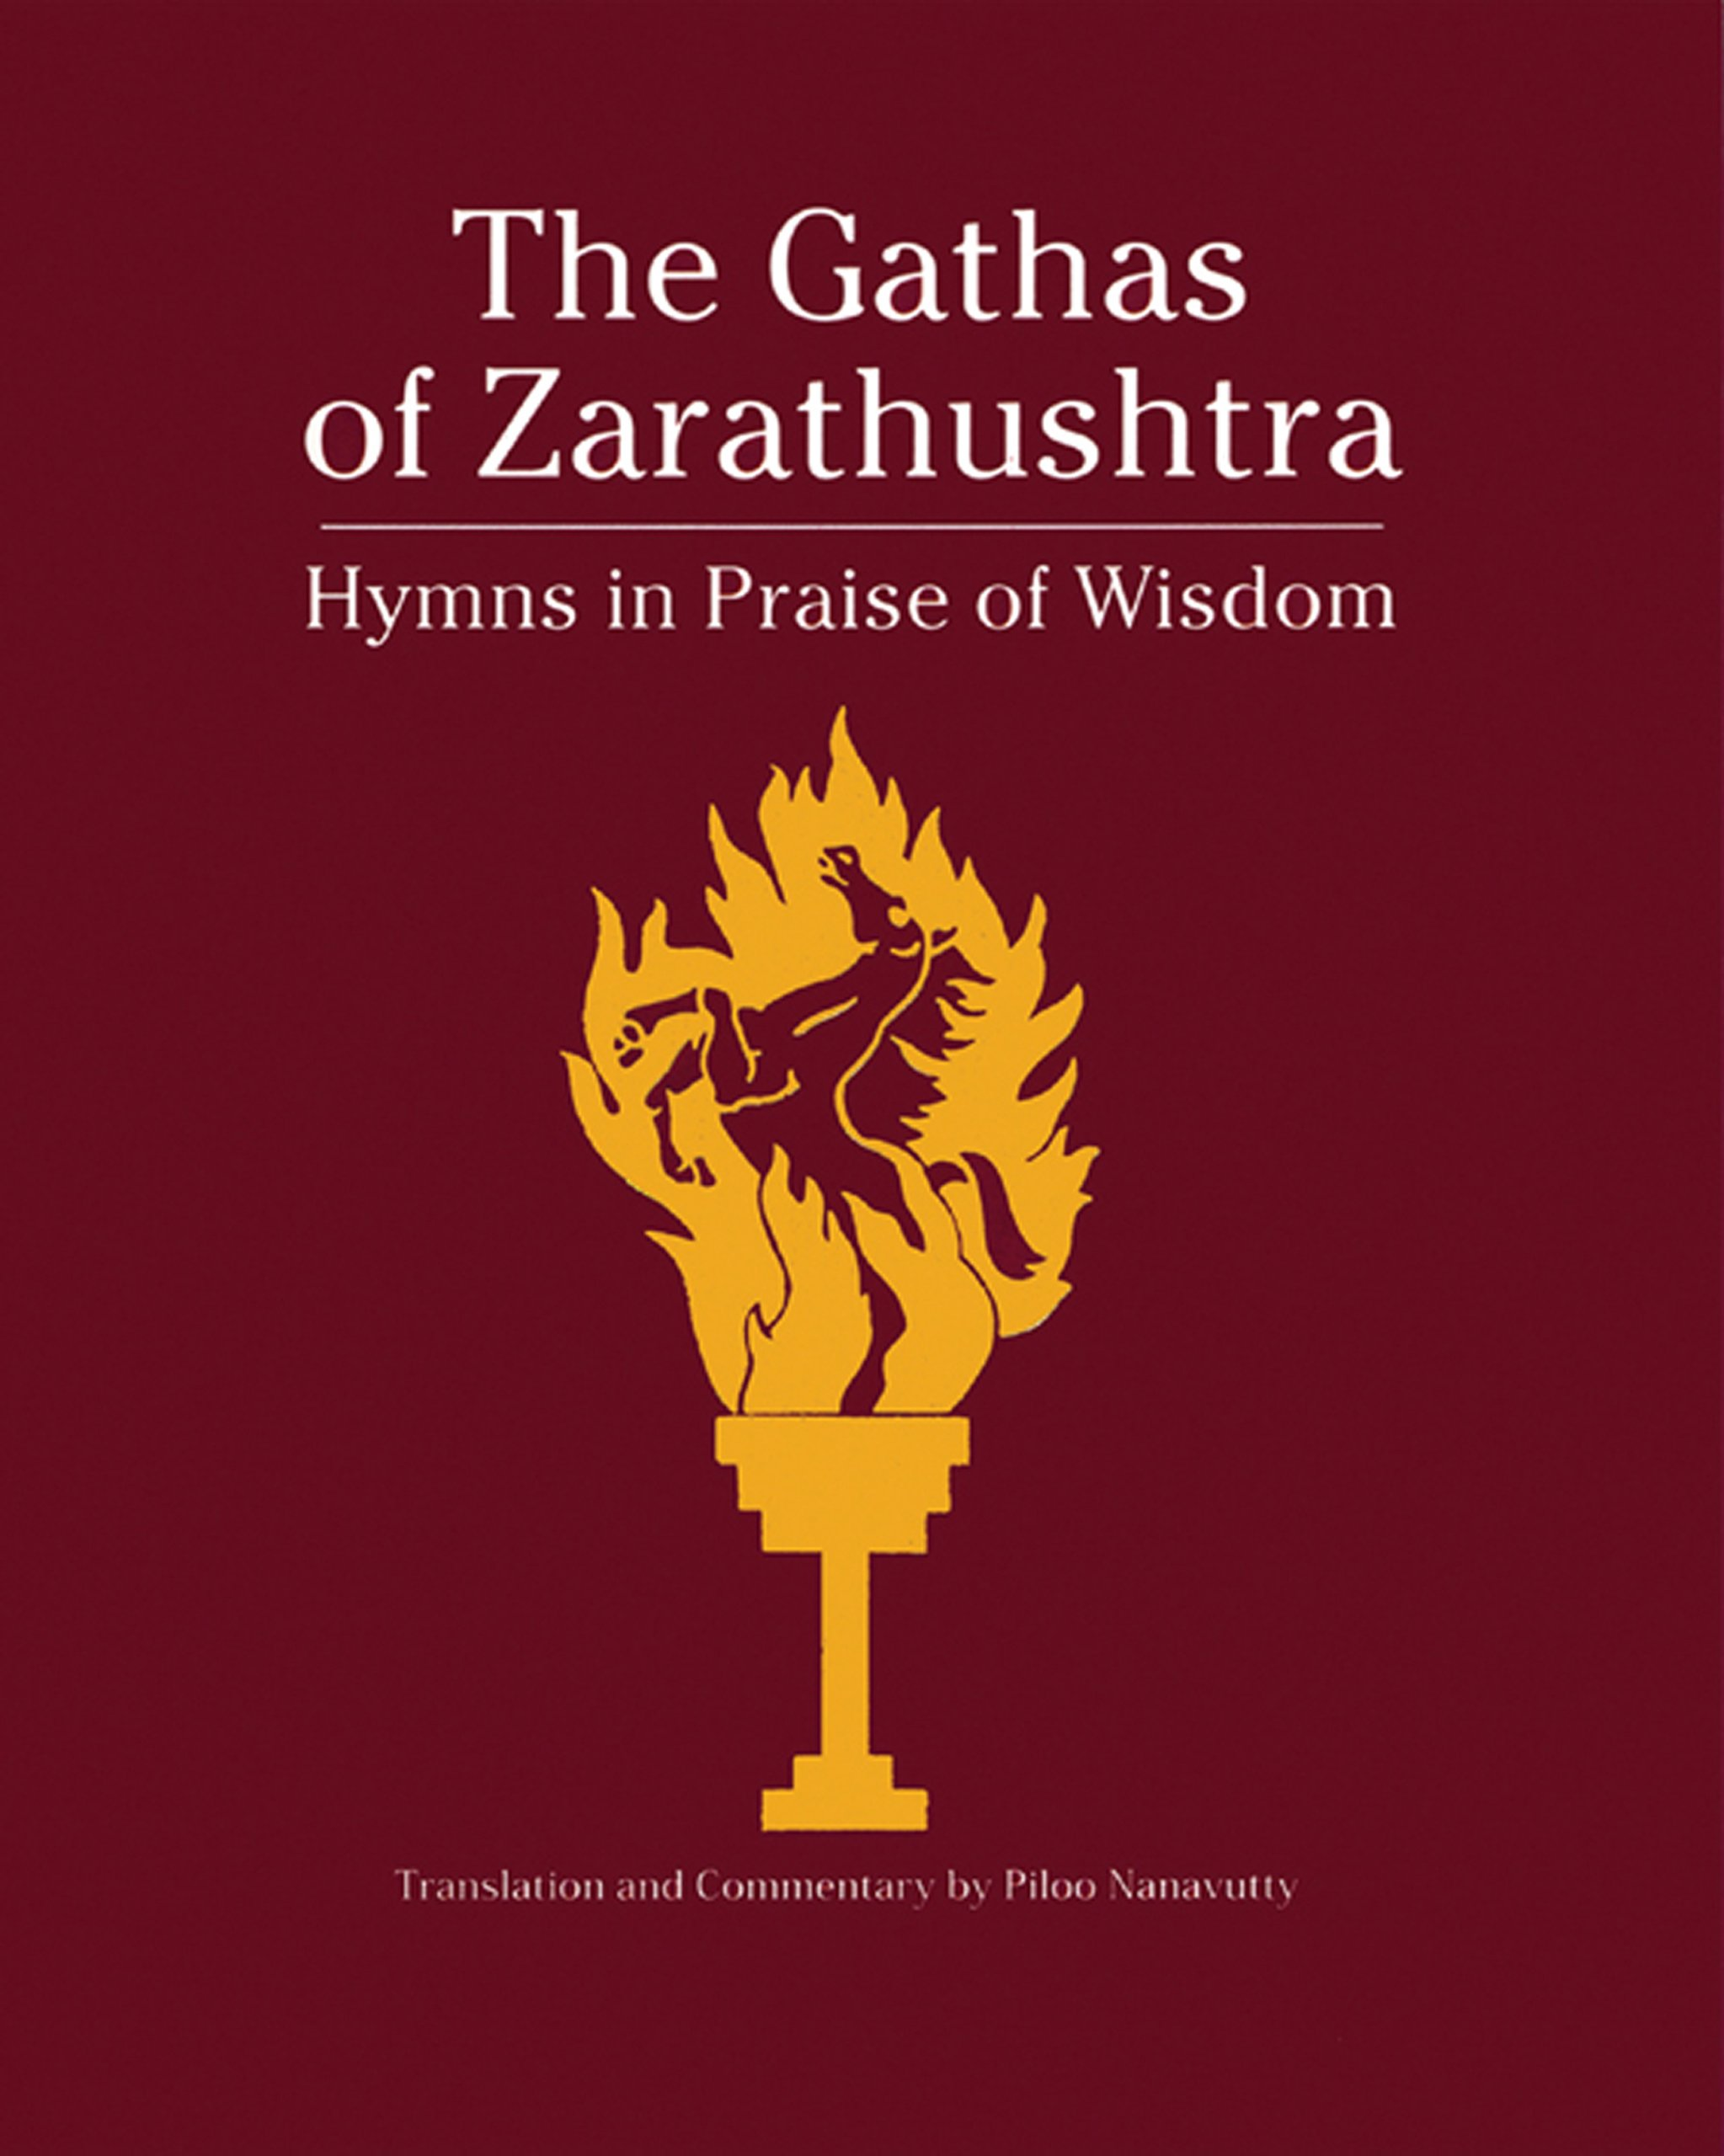 The Gathas of Zarathushtra: Hymns in Praise of Wisdom